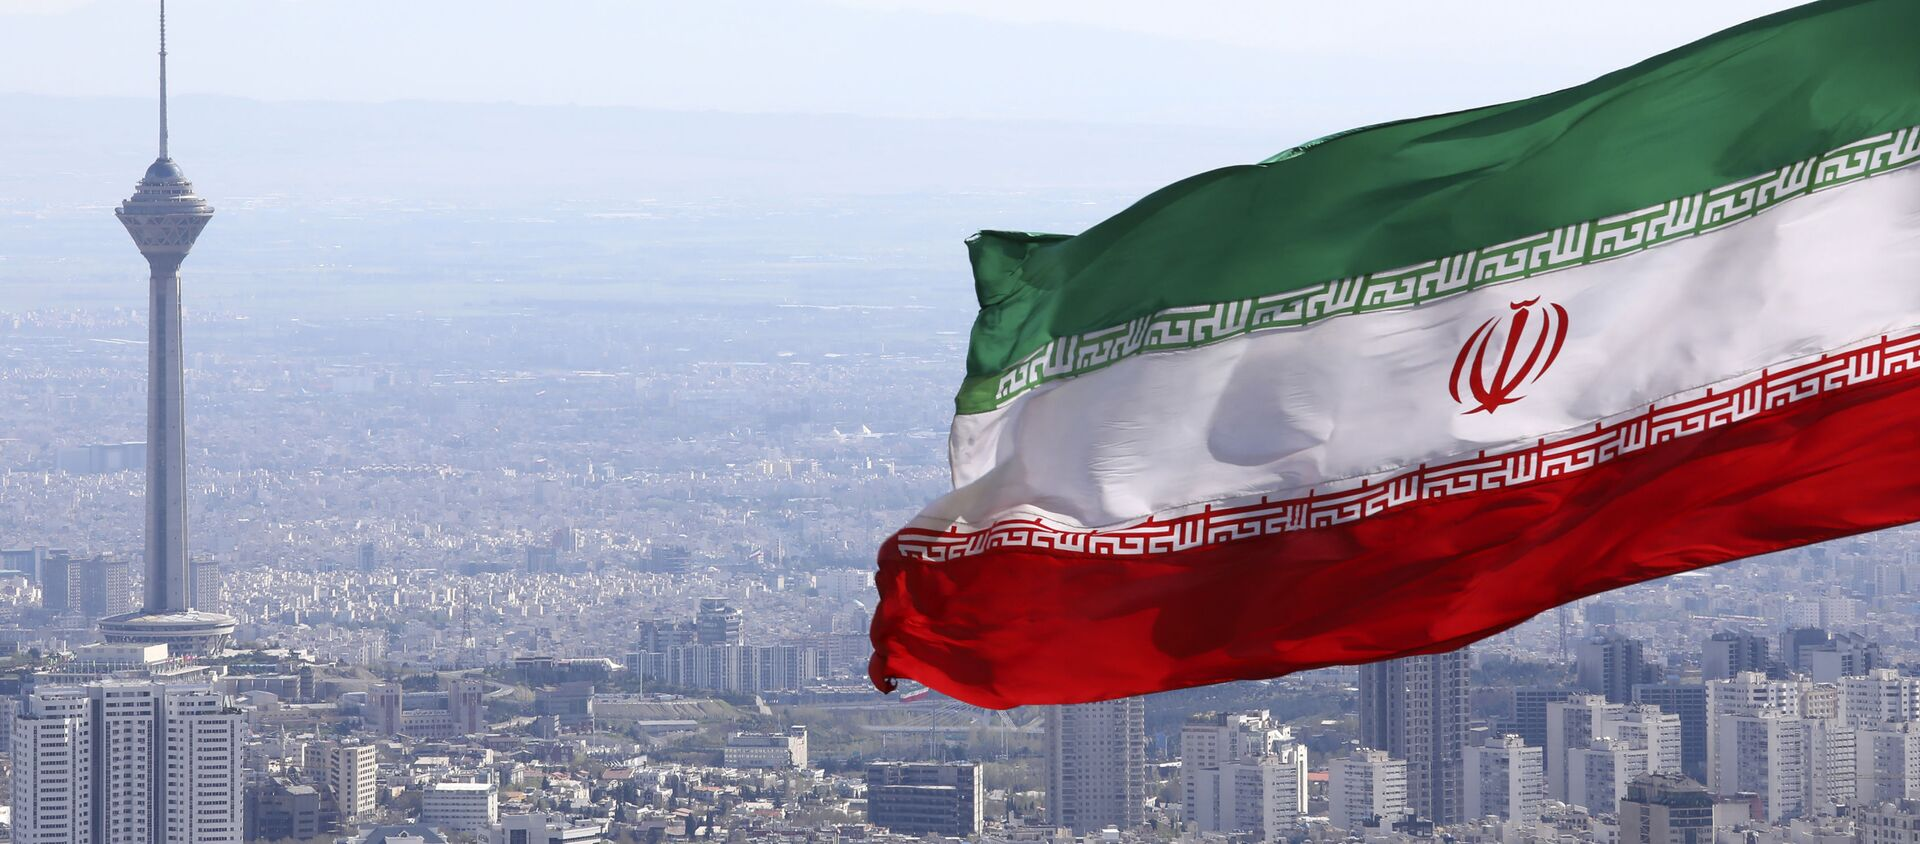 Bandiera iraniana, Iran, Teheran - Sputnik Italia, 1920, 16.02.2021